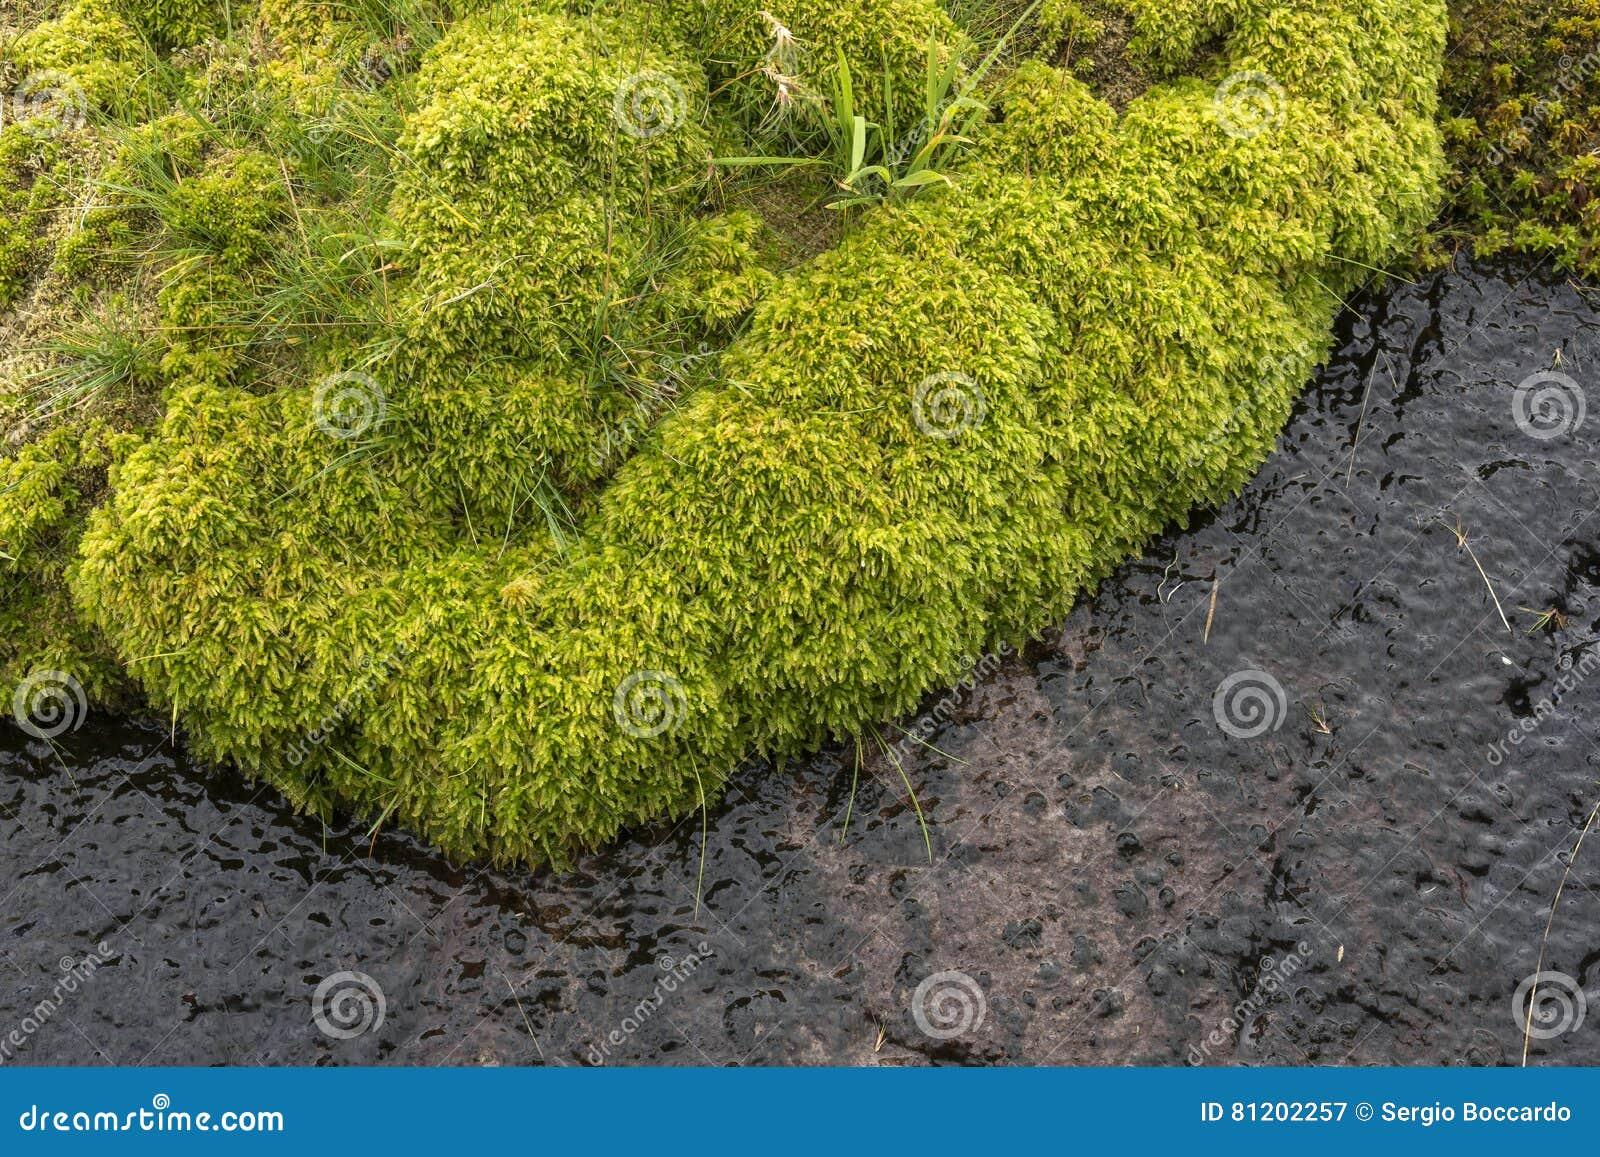 moss in Norway